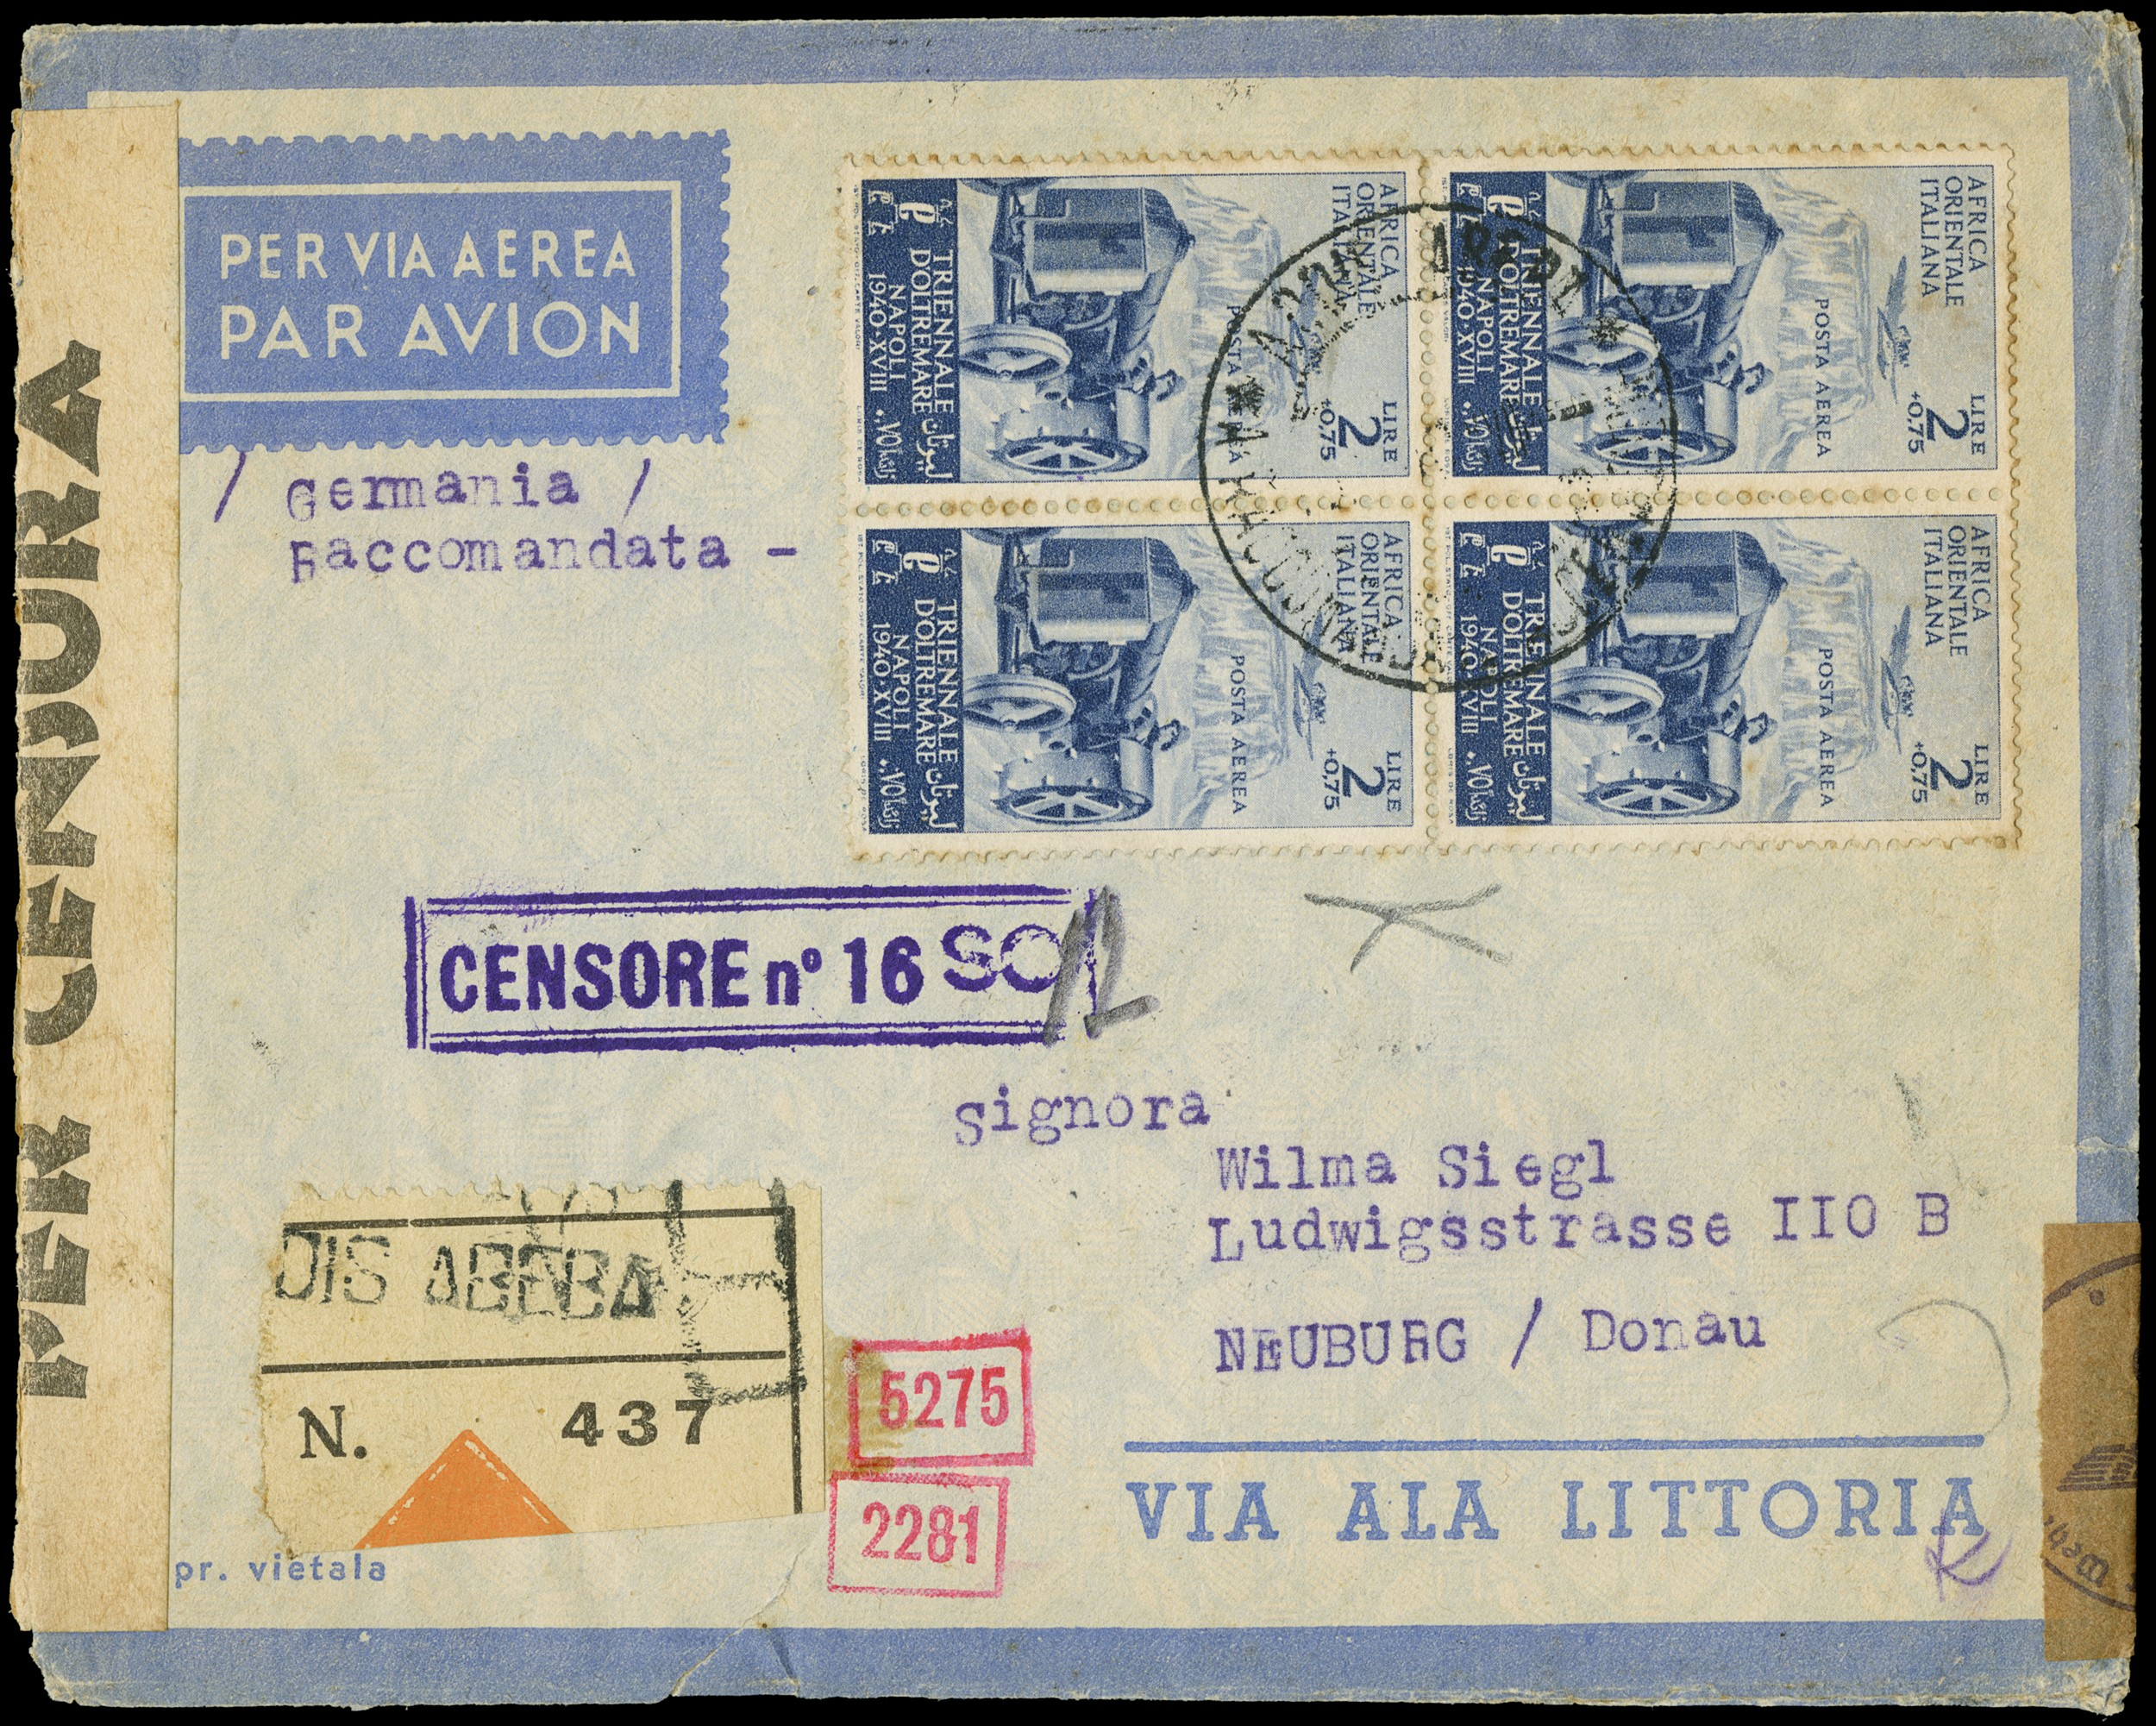 Lot 1354 - Colonie Italiane - Africa Orientale Italiana posta aerea -  Zanaria Aste s.r.l. 9th Philatelic Auction